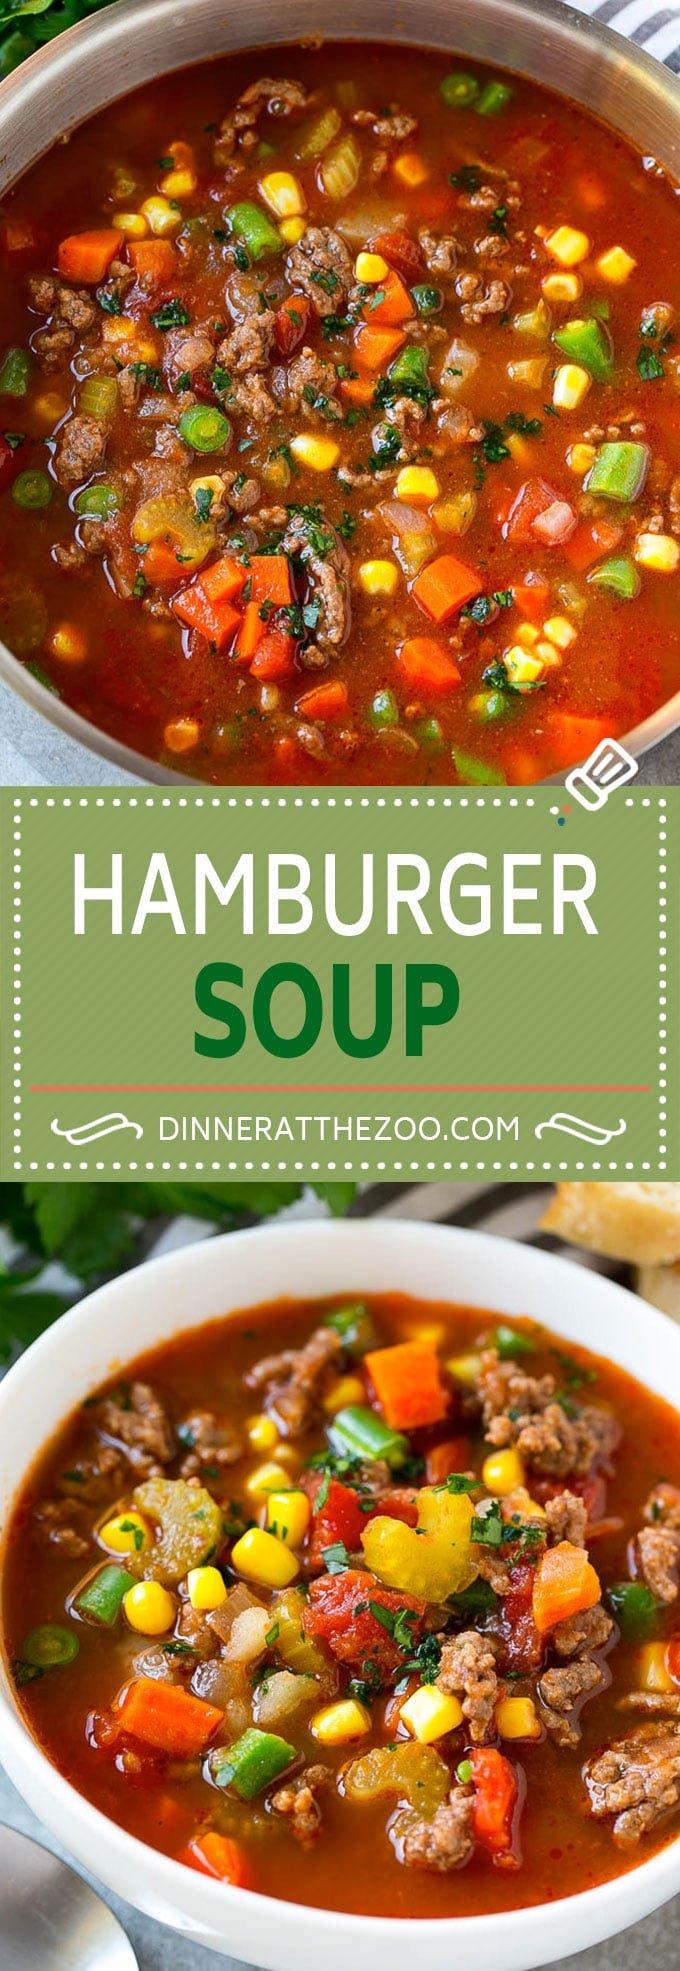 Hamburger Soup Recipe | Hamburger and Vegetable Soup | Hamburger and Potato Soup | Hamburger Stew | Ground Beef Soup #soup #hamburger #groundbeef #dinner #veggies #dinneratthezoo